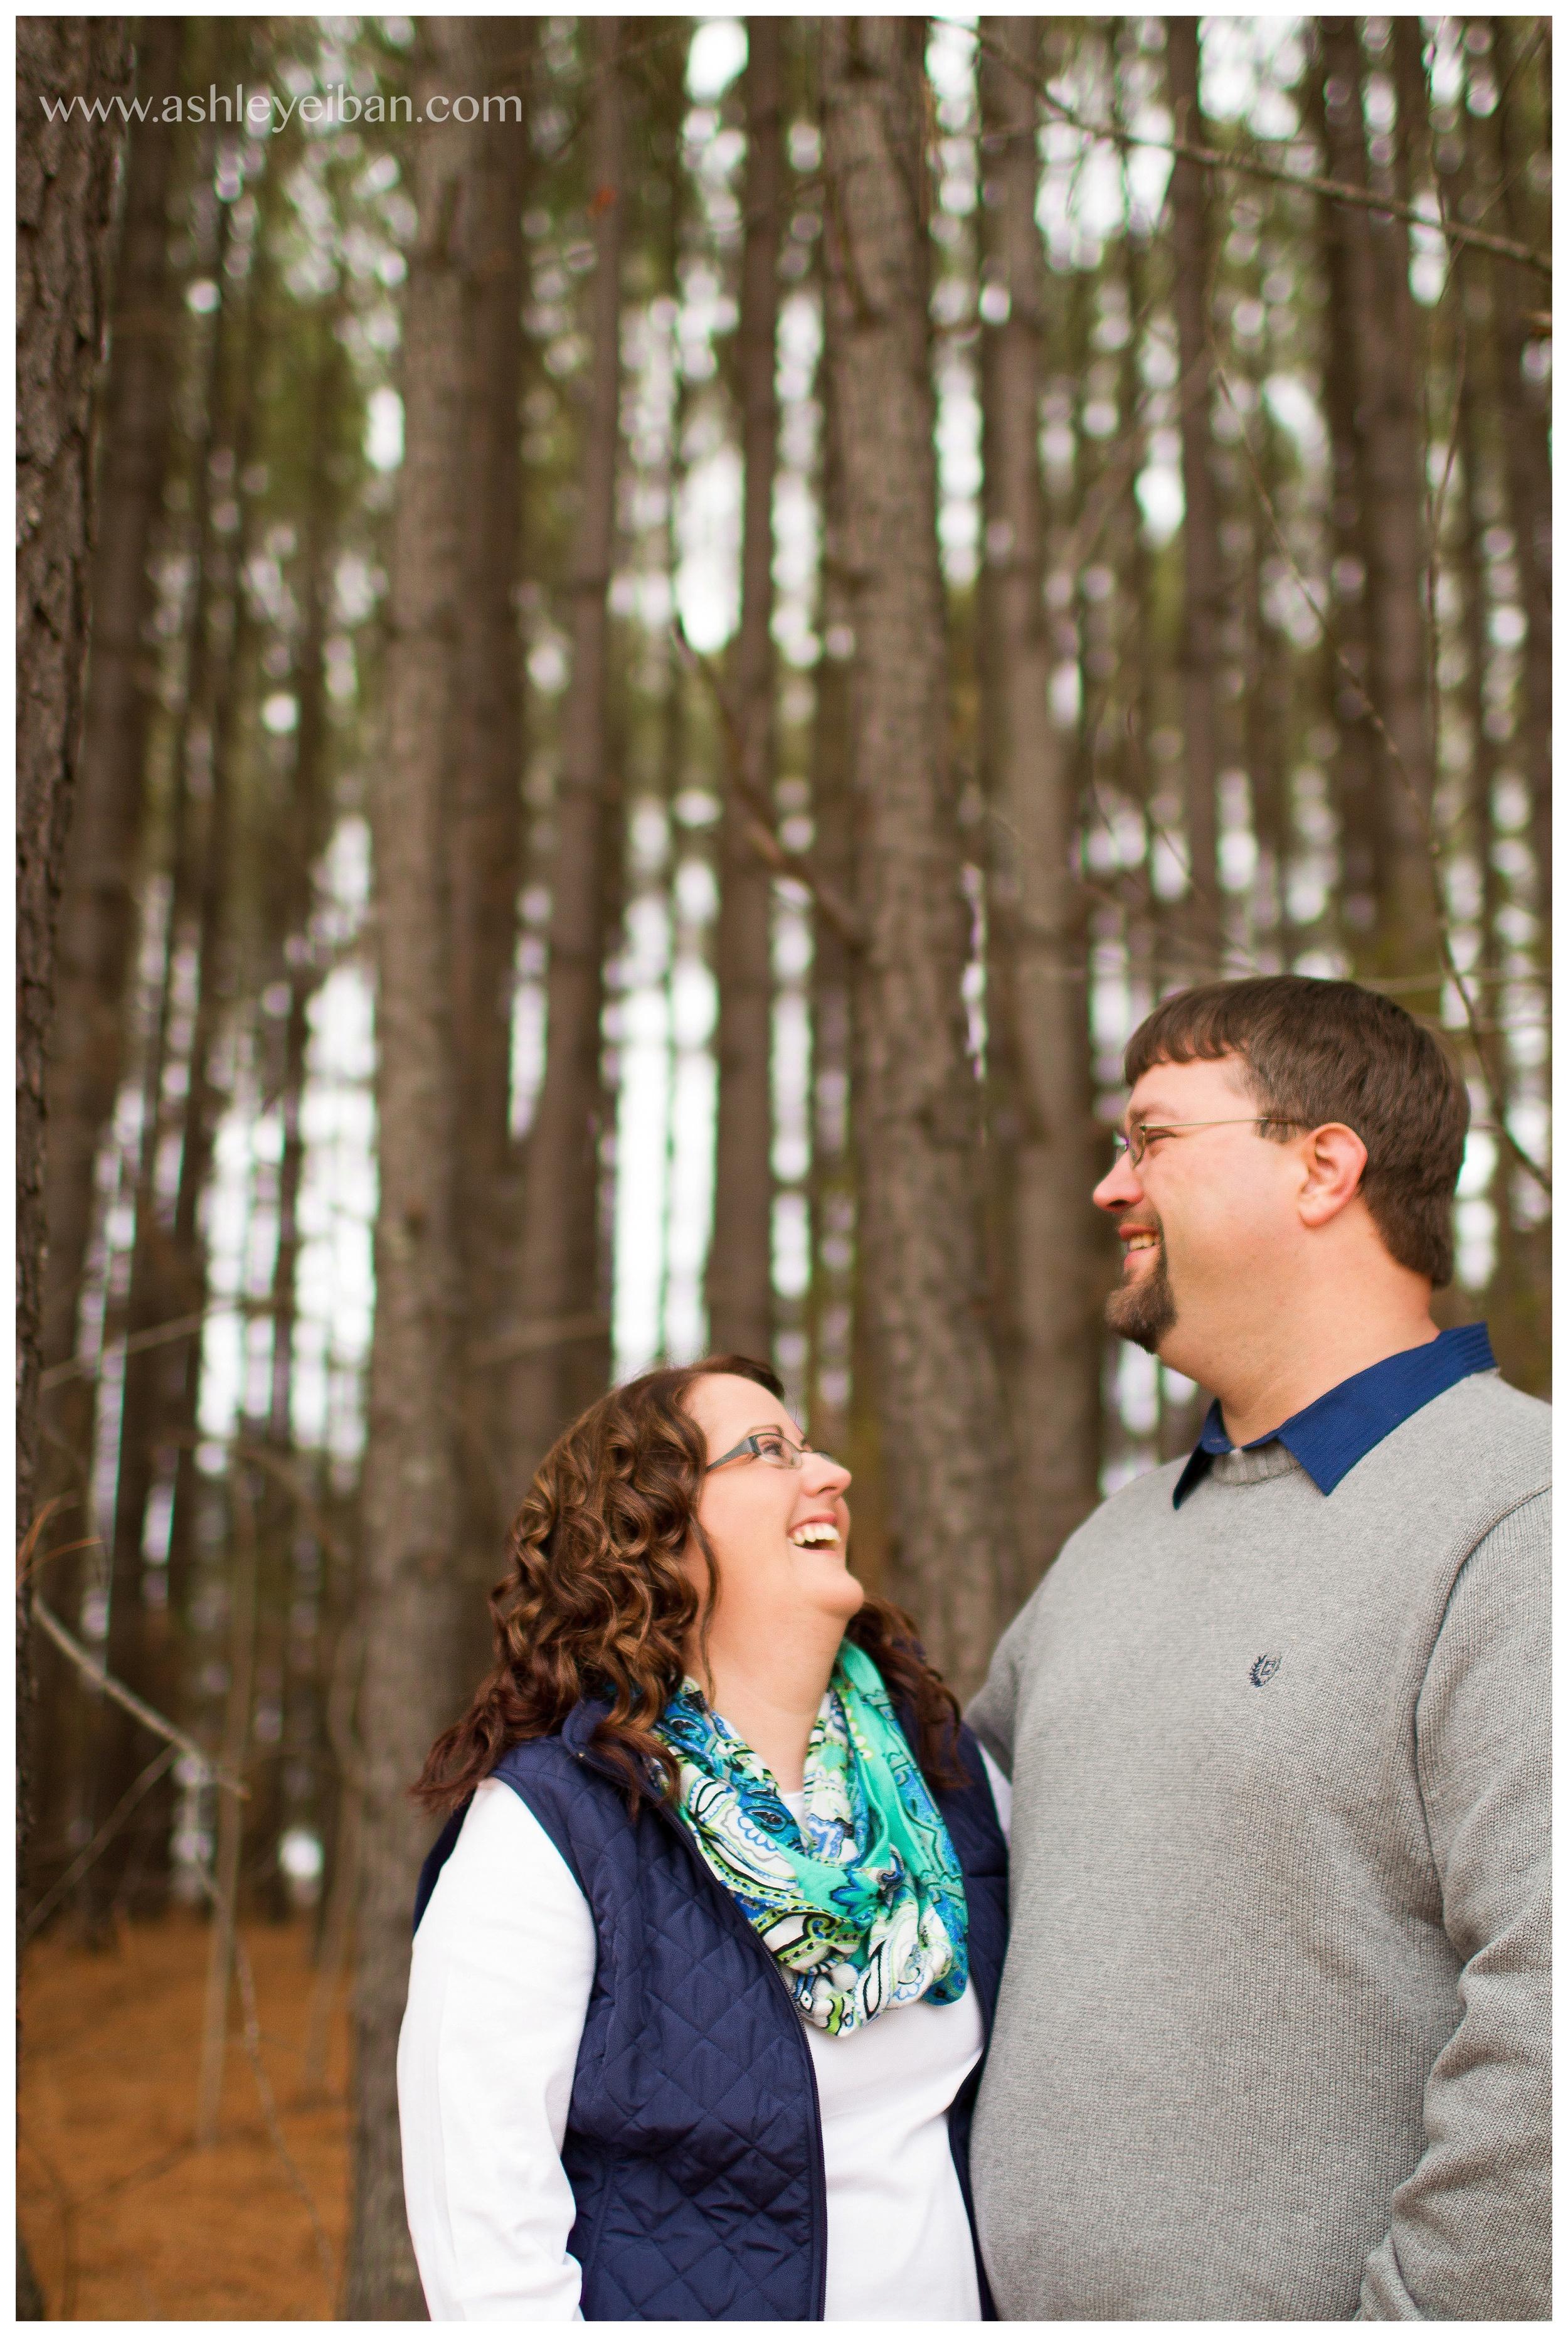 Rustic Lynchburg Virginia Engagement Session // Ashley Eiban Photography